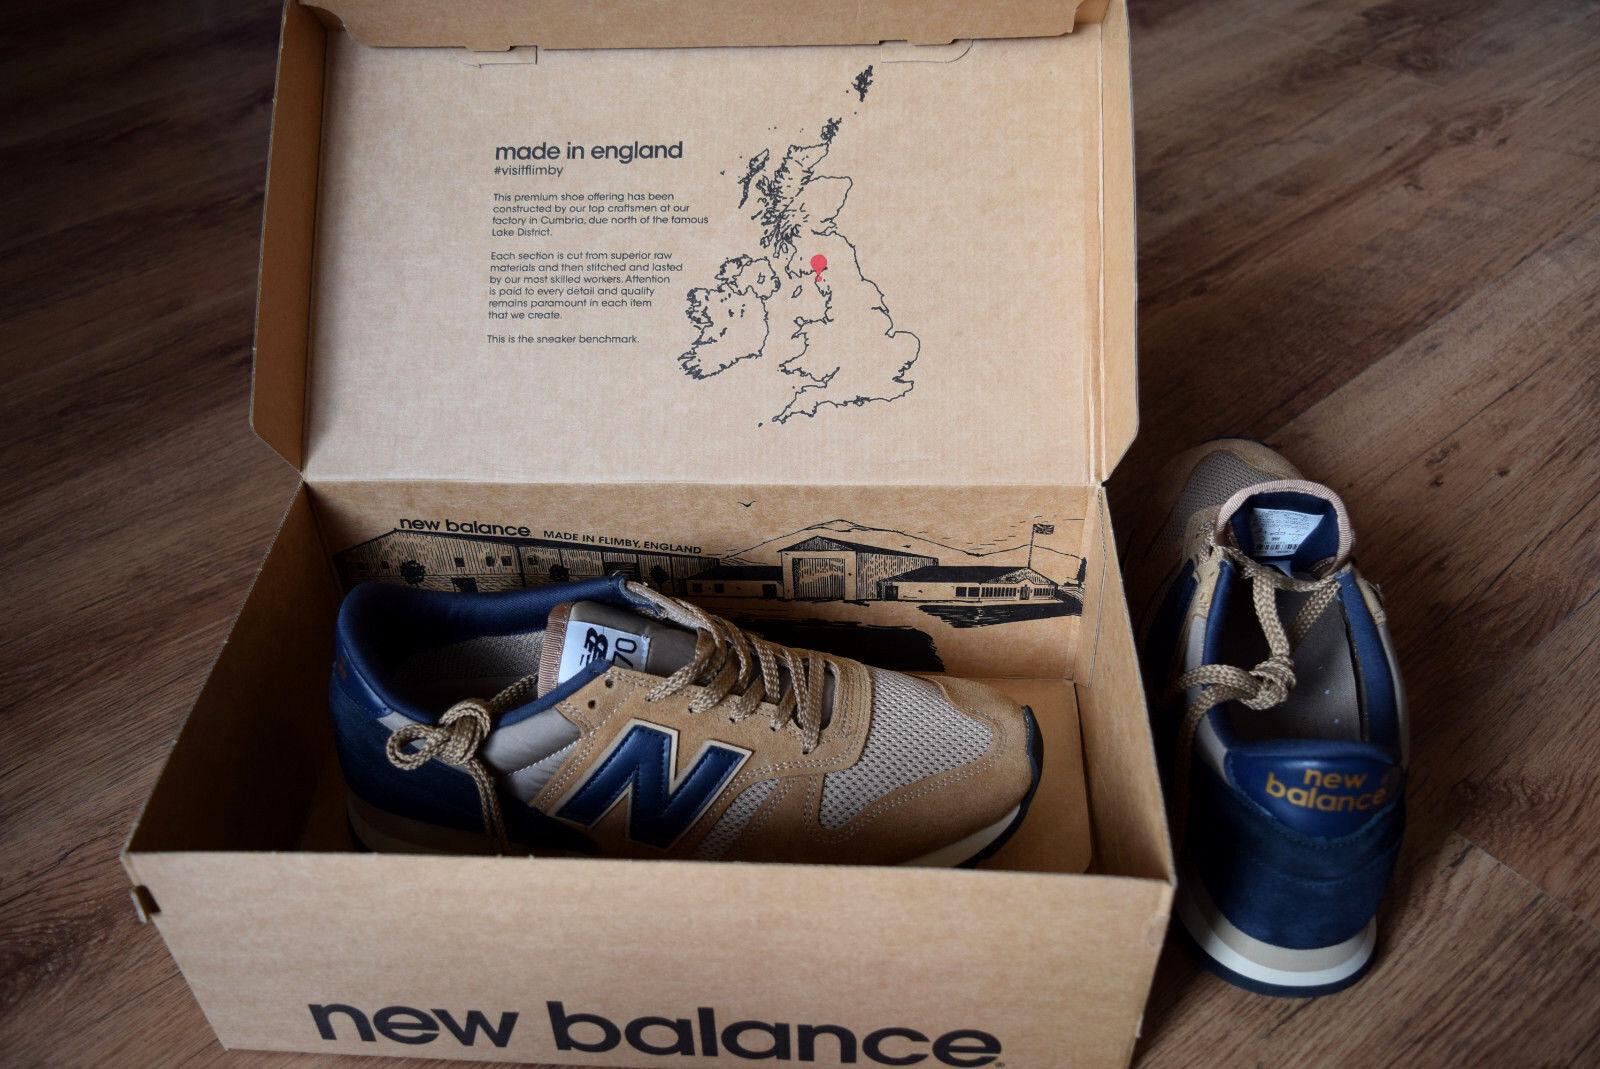 New balance balance balance m 770 SBN 40 40,5 41,5 42 43 44 fabricado en Inglaterra Classic 576 m770sbn 790f47